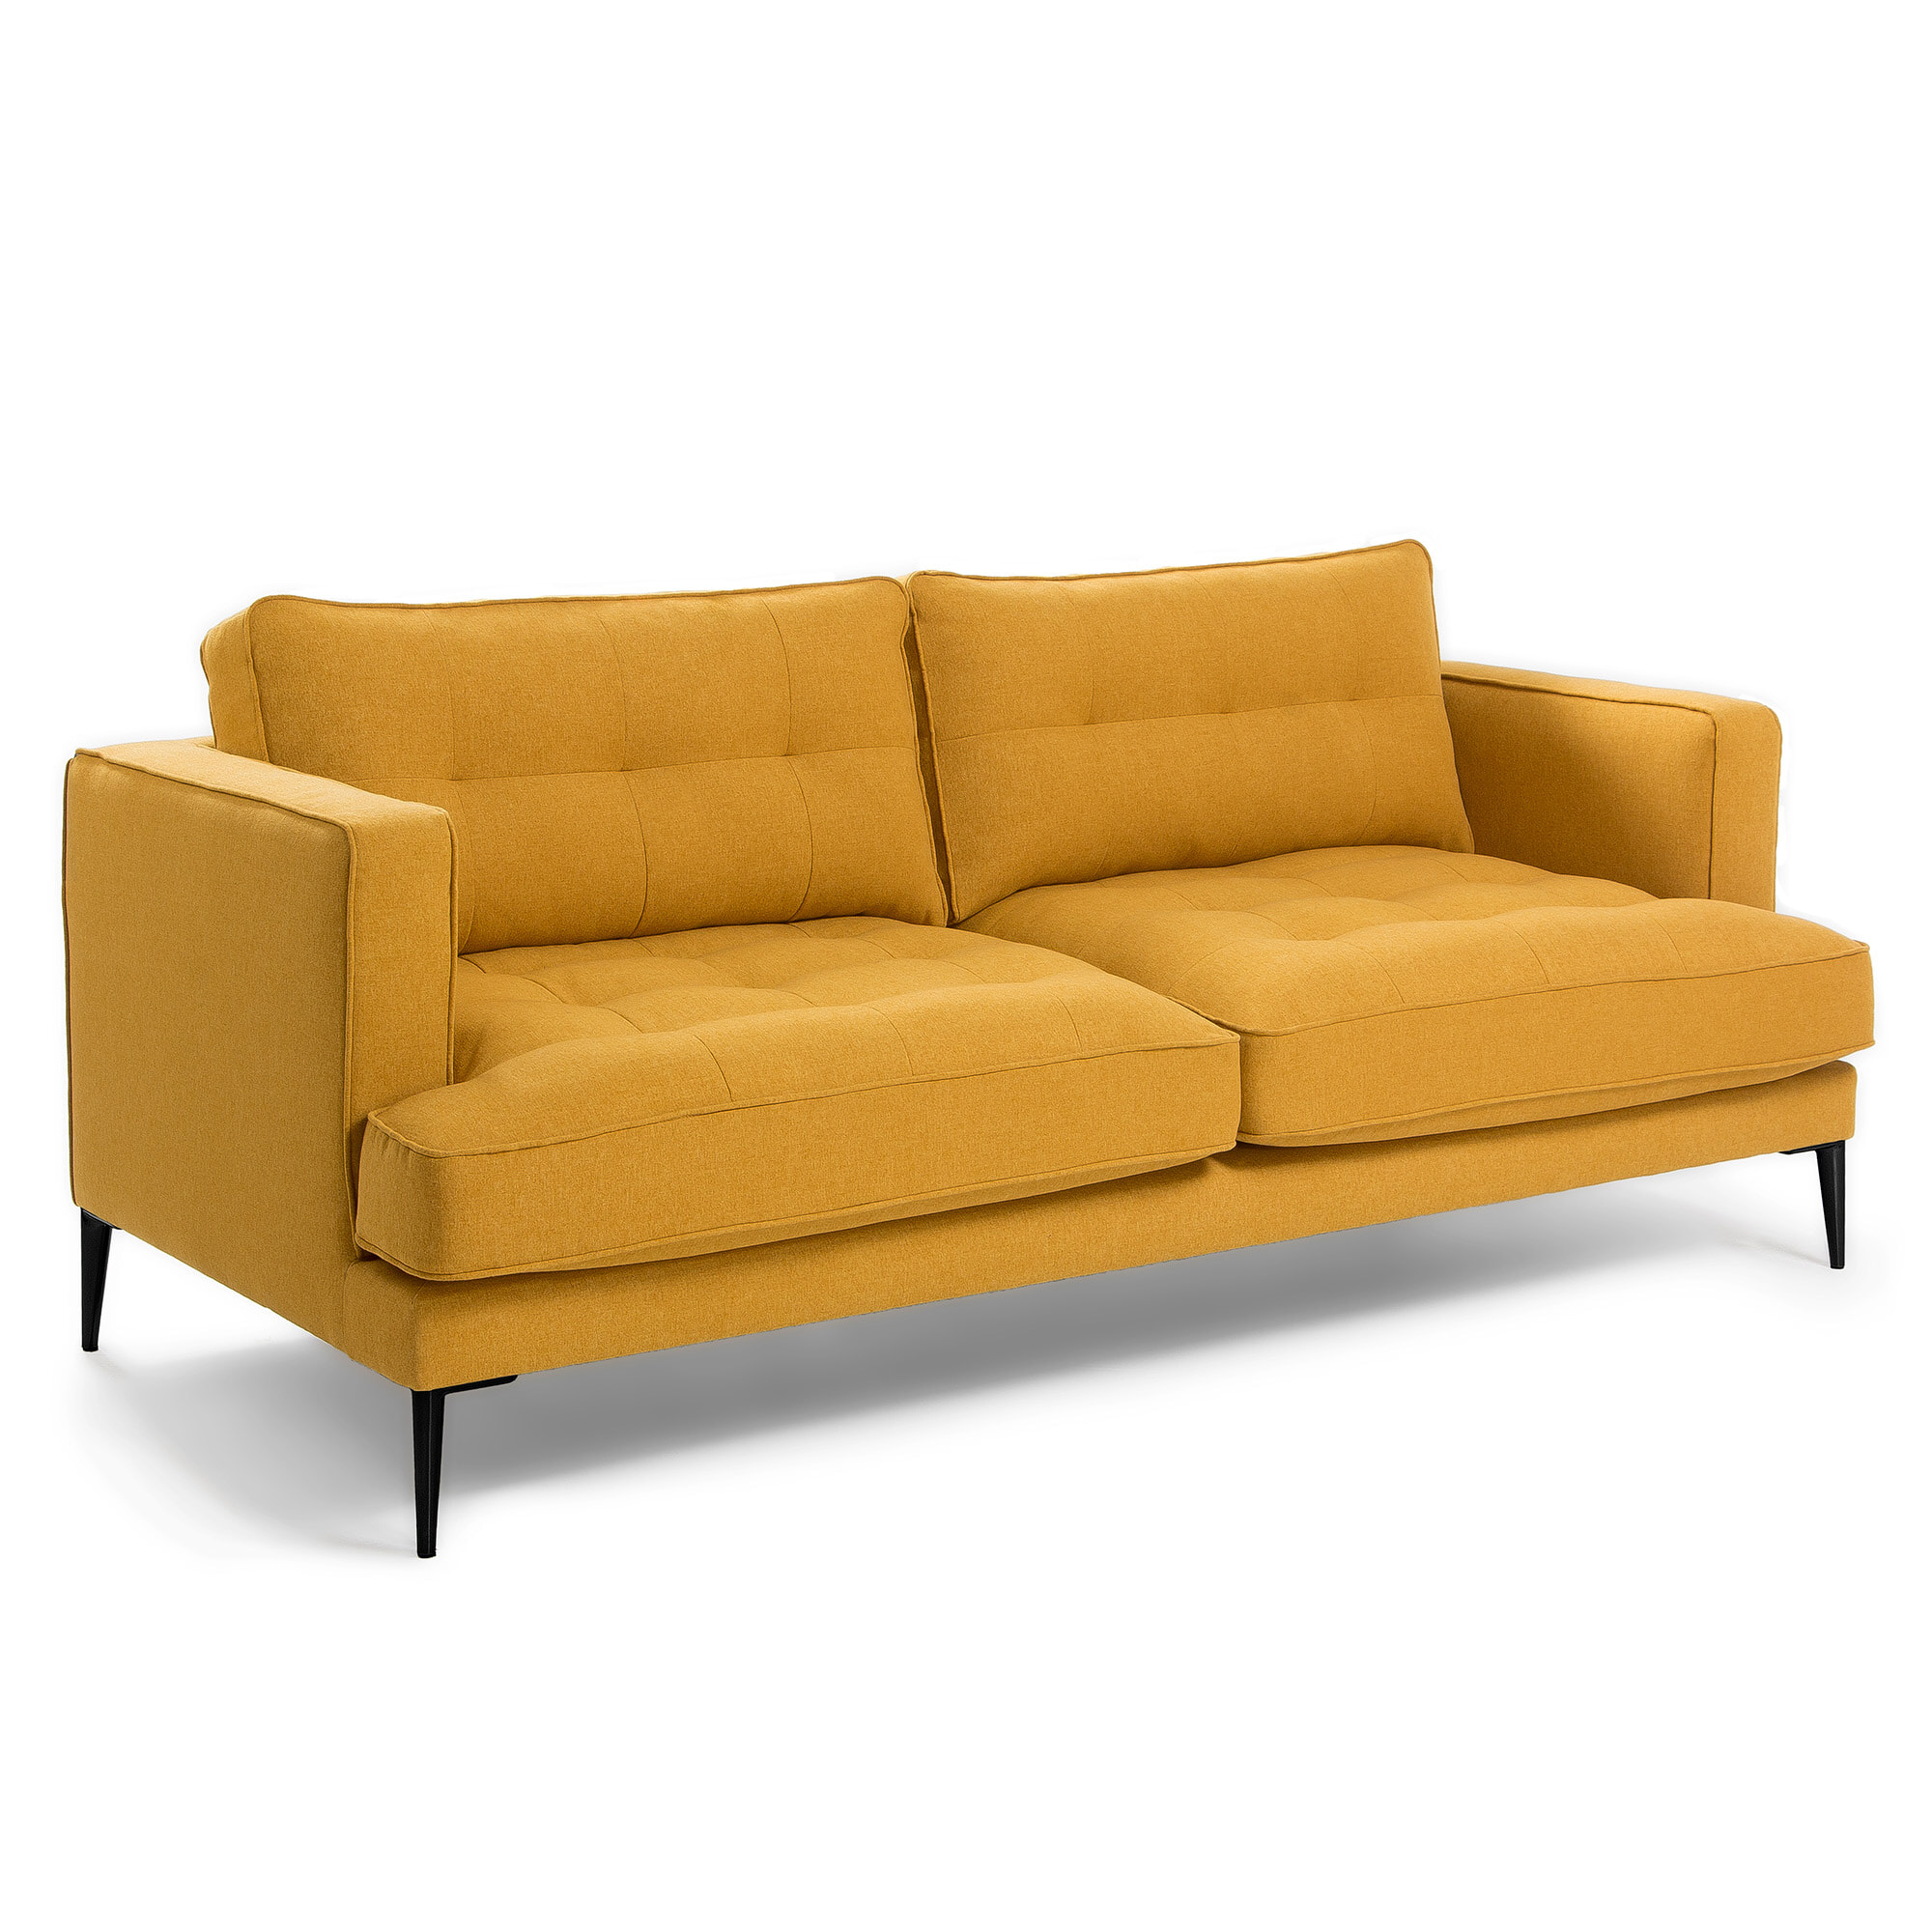 Kave Home 3-zits Bank 'Tanya' kleur Mosterdgeel